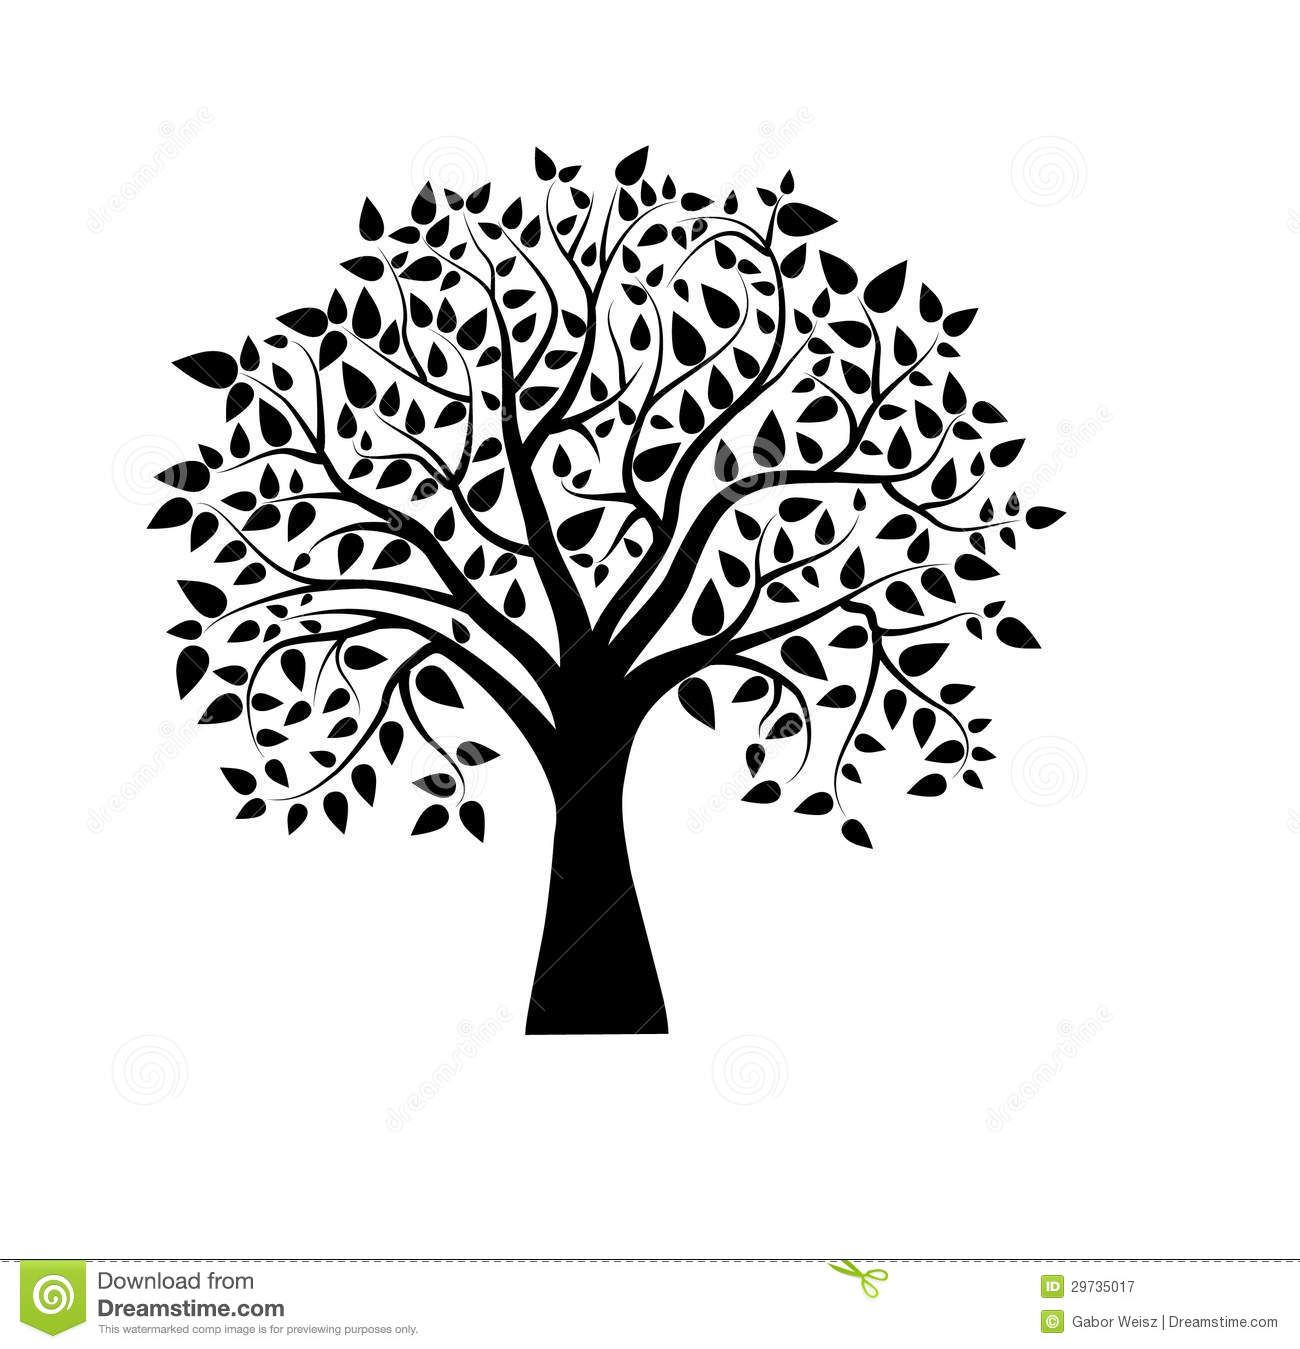 Arvore Desenho Preto E Branco Pesquisa Do Google Cool Tree